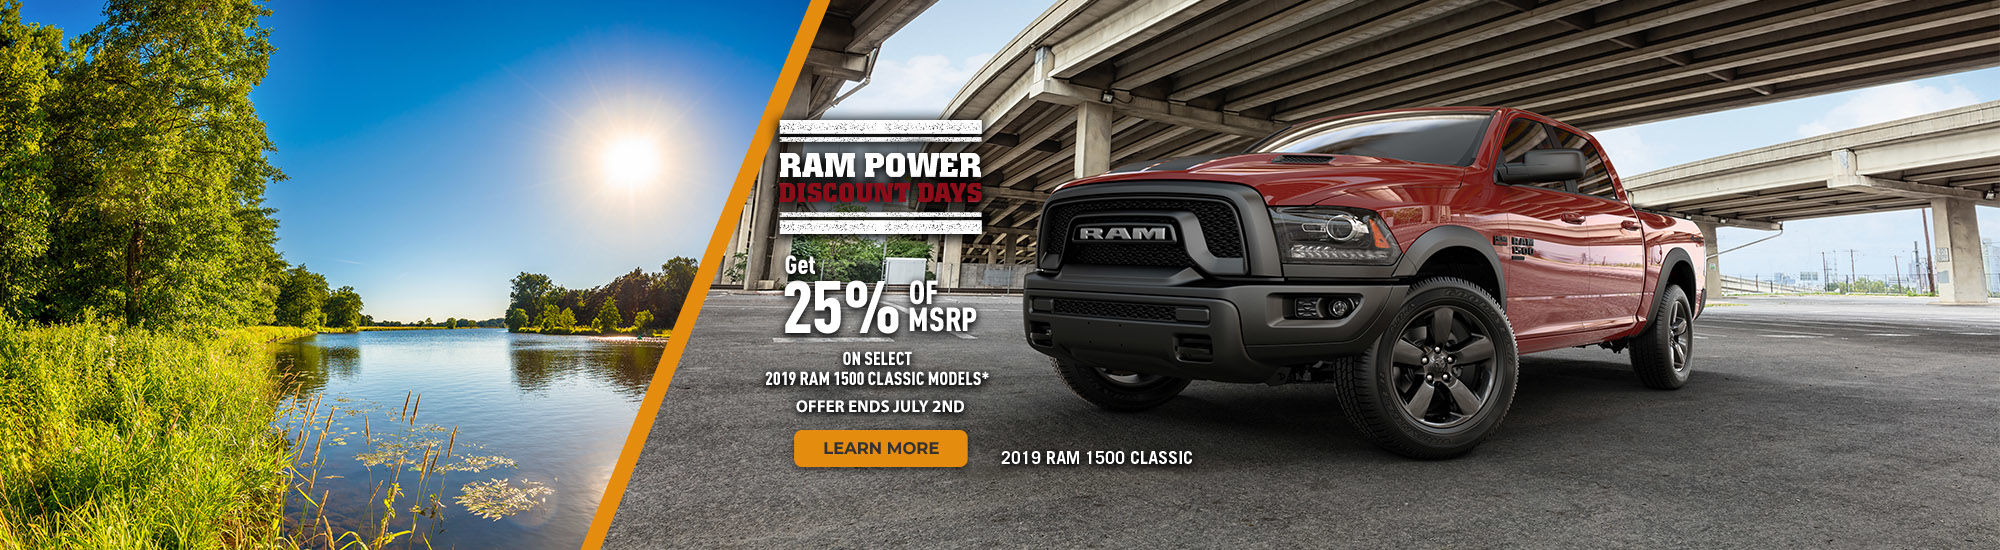 RAM power discount days